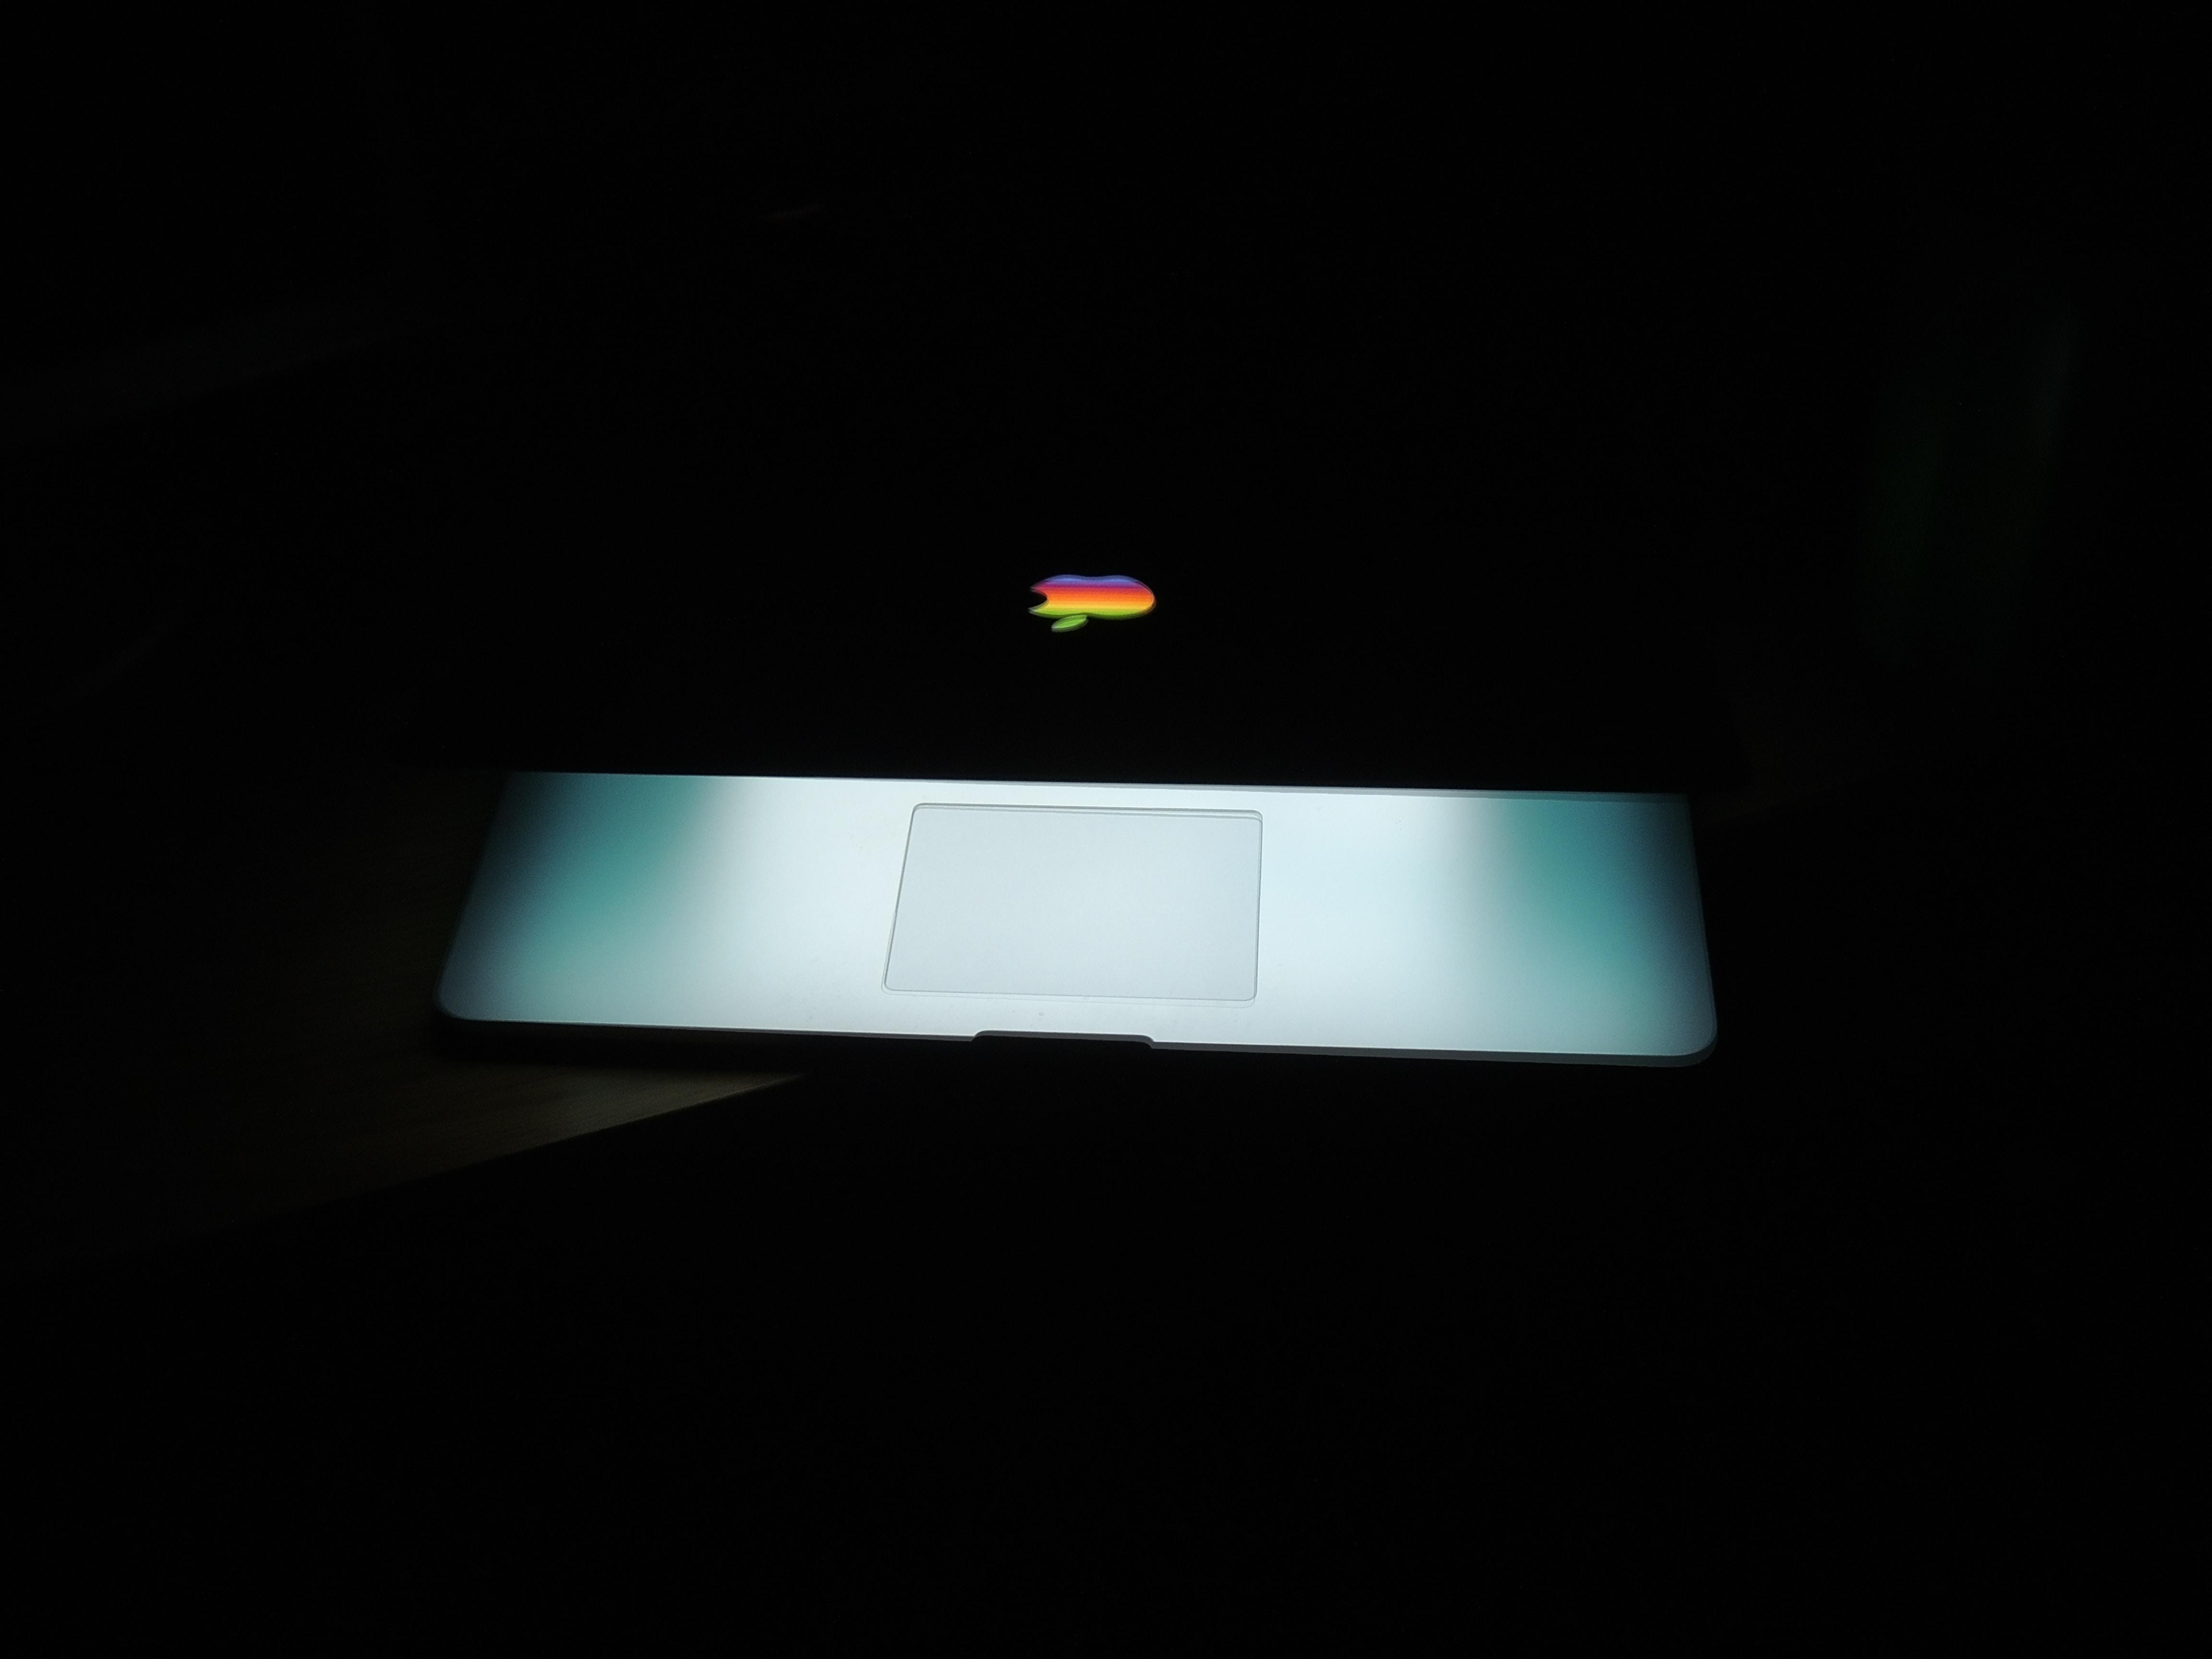 silver MacBook